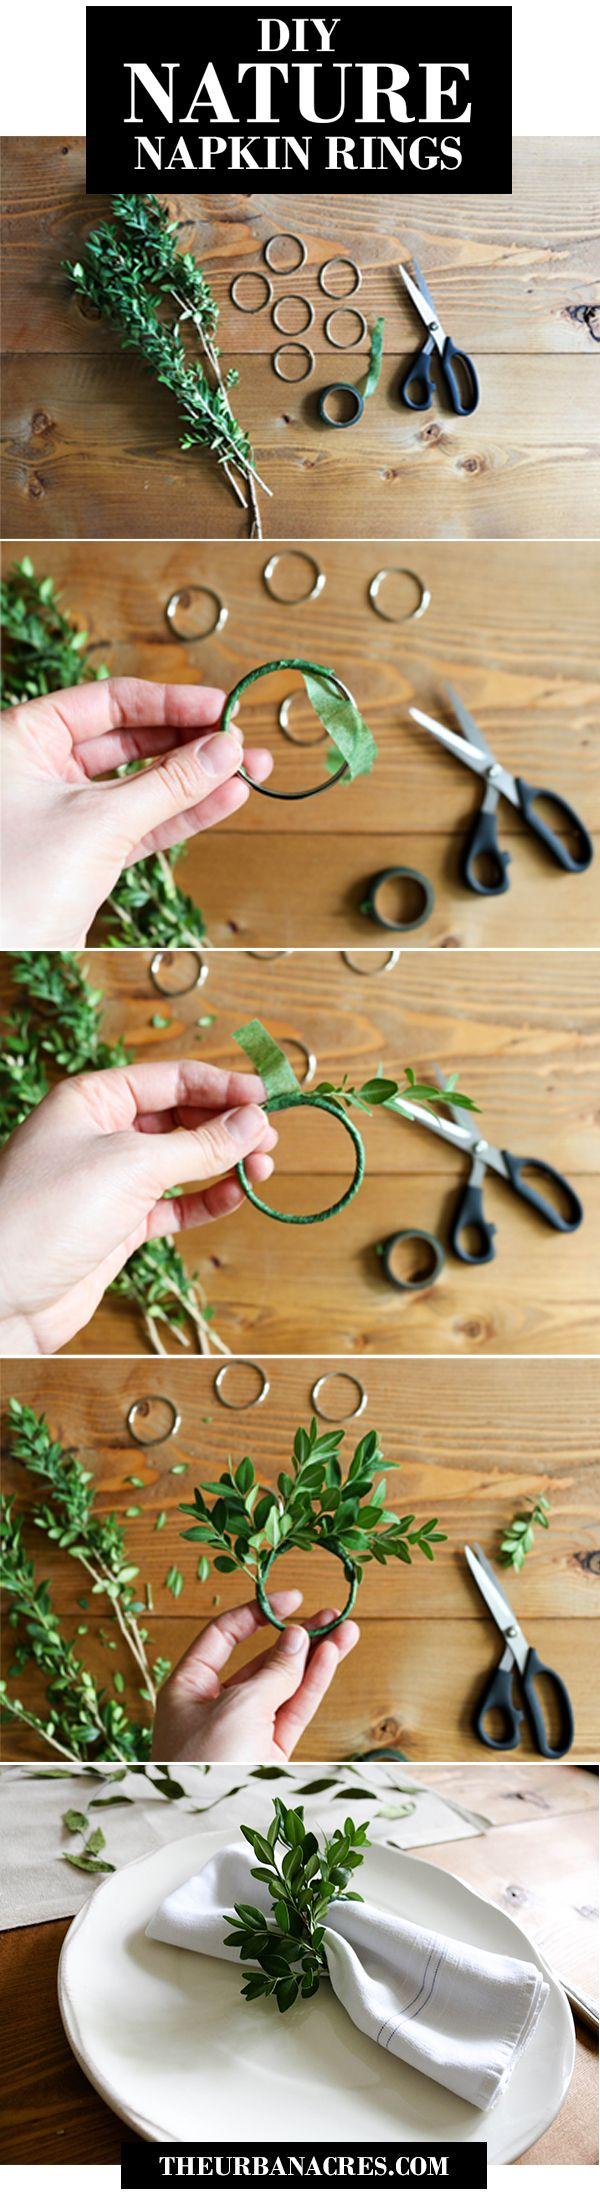 Nature napkin rings diy pinterest napkin rings napkins and ring diy nature napkin rings for your table solutioingenieria Gallery